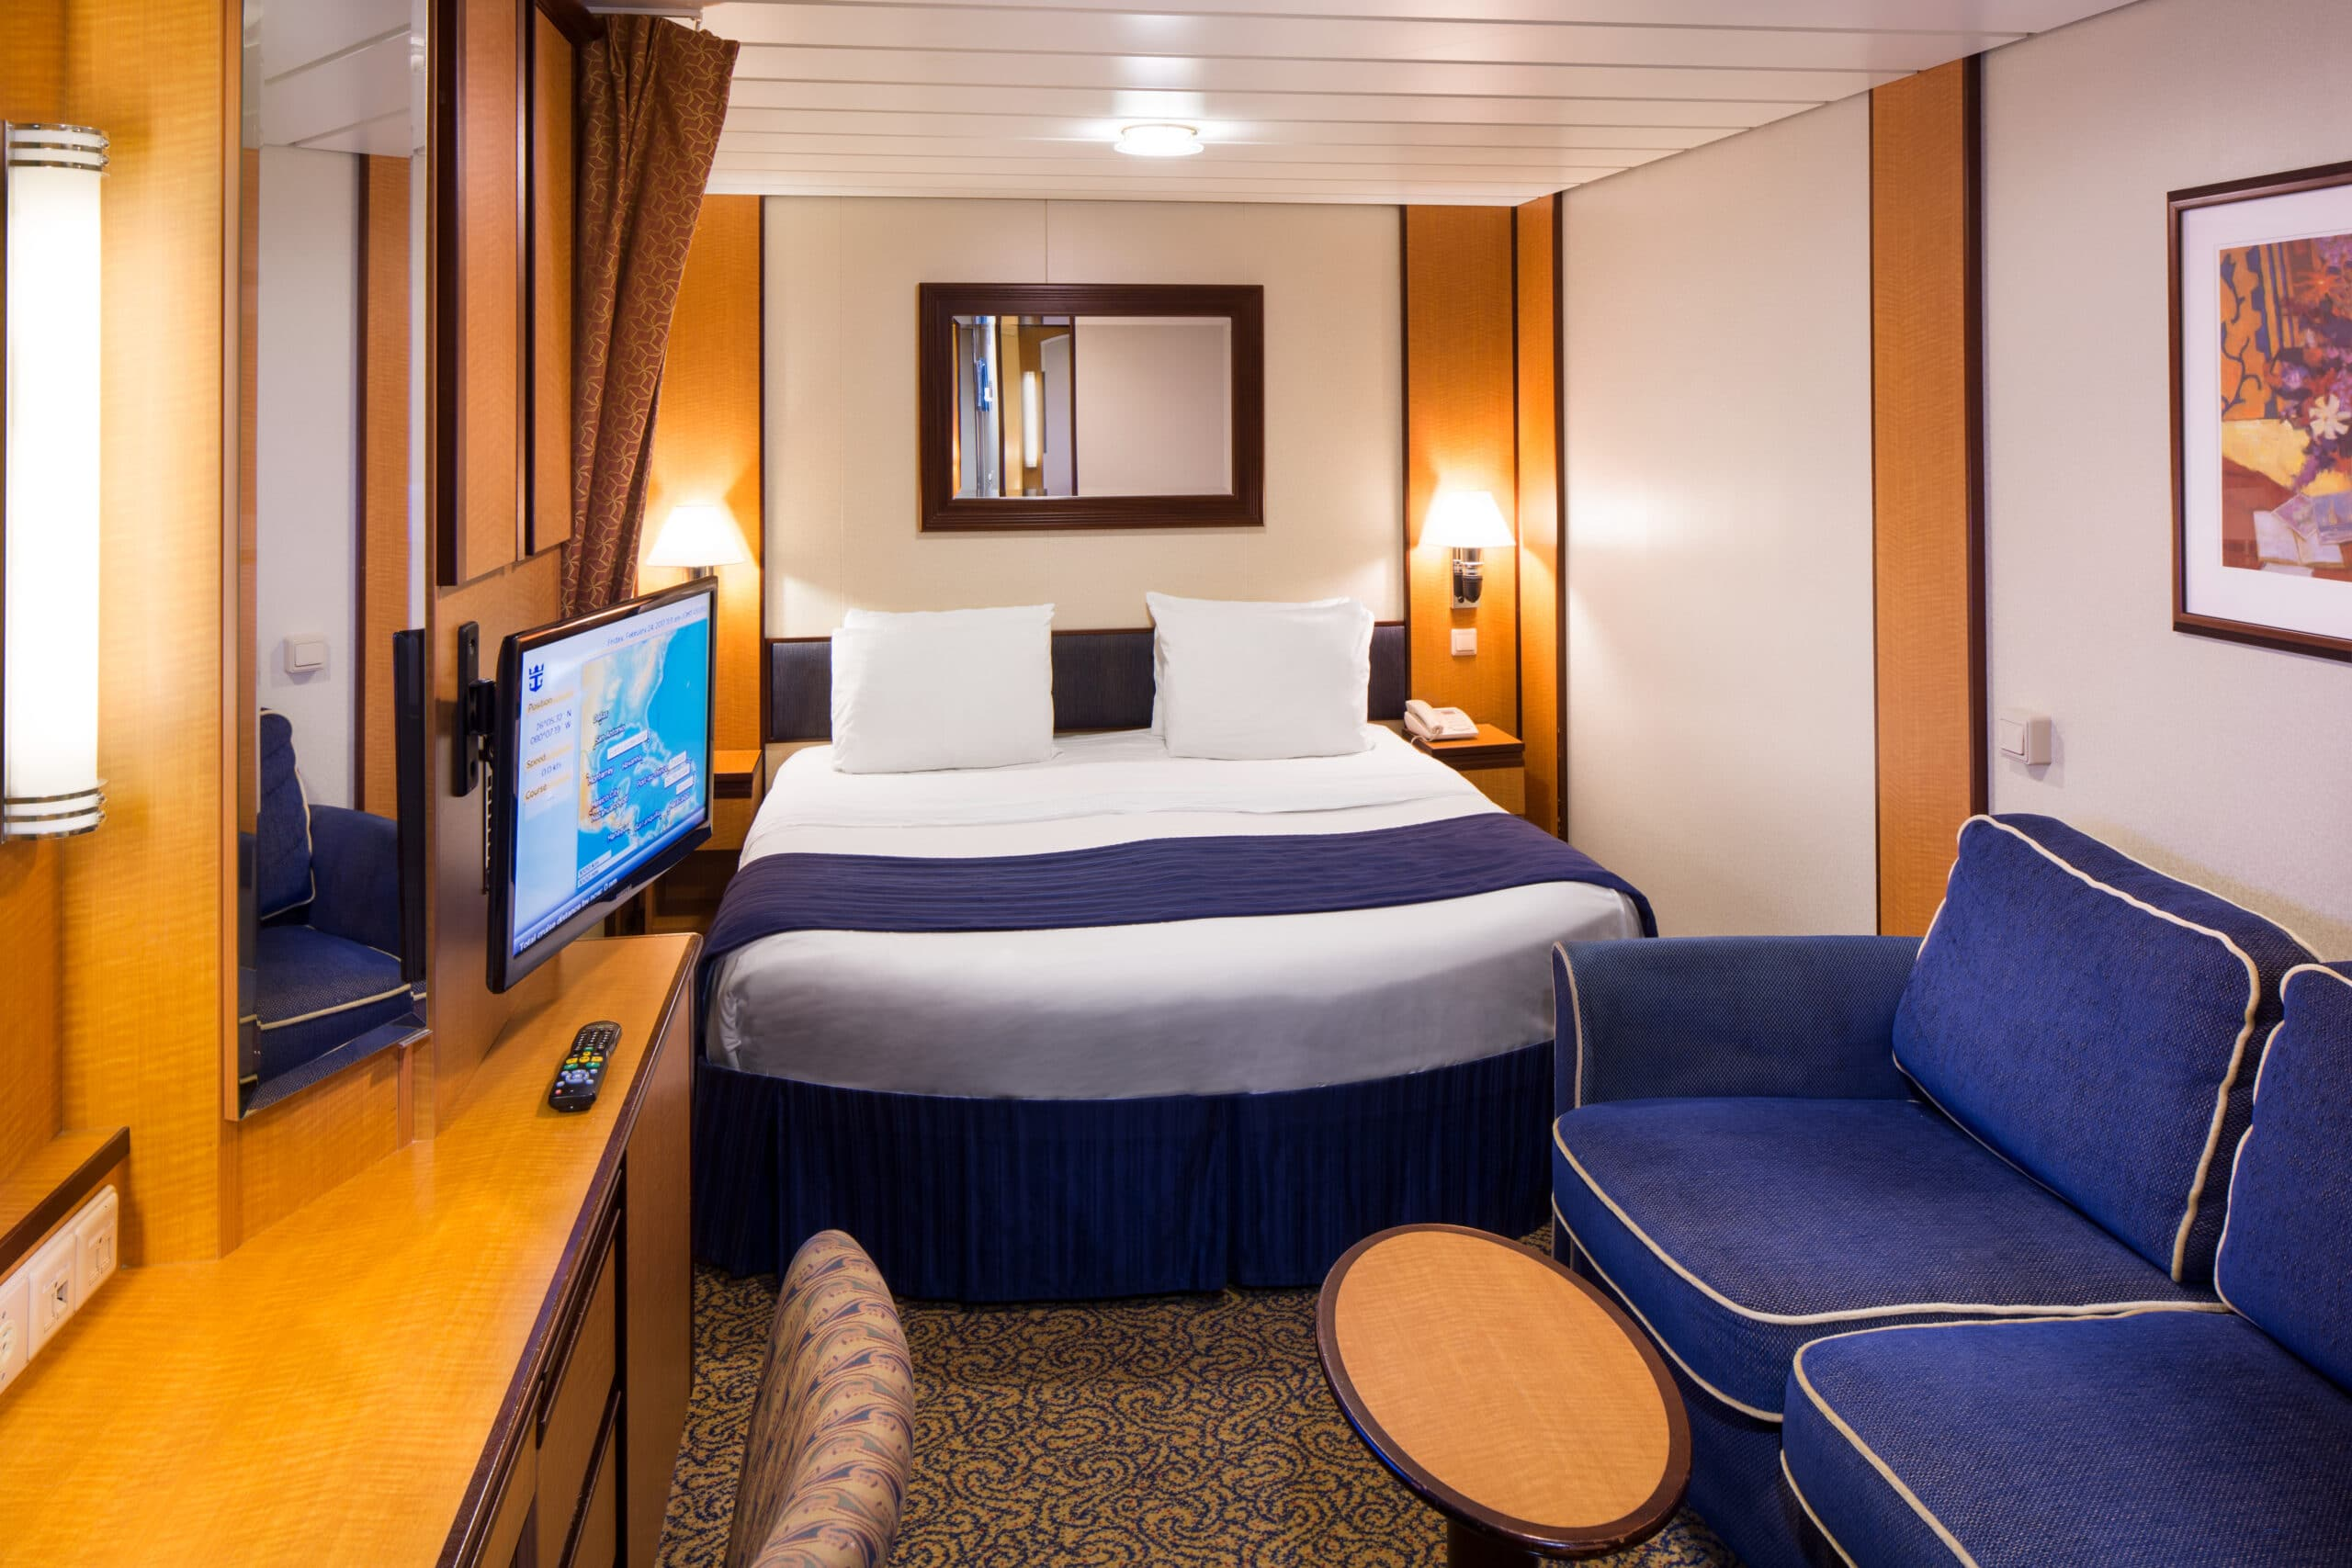 Royal-Caribbean-International-Serenade-of-the-Seas-schip-cruiseschip-categorie-1V-2V-3V-4V-binnenhut